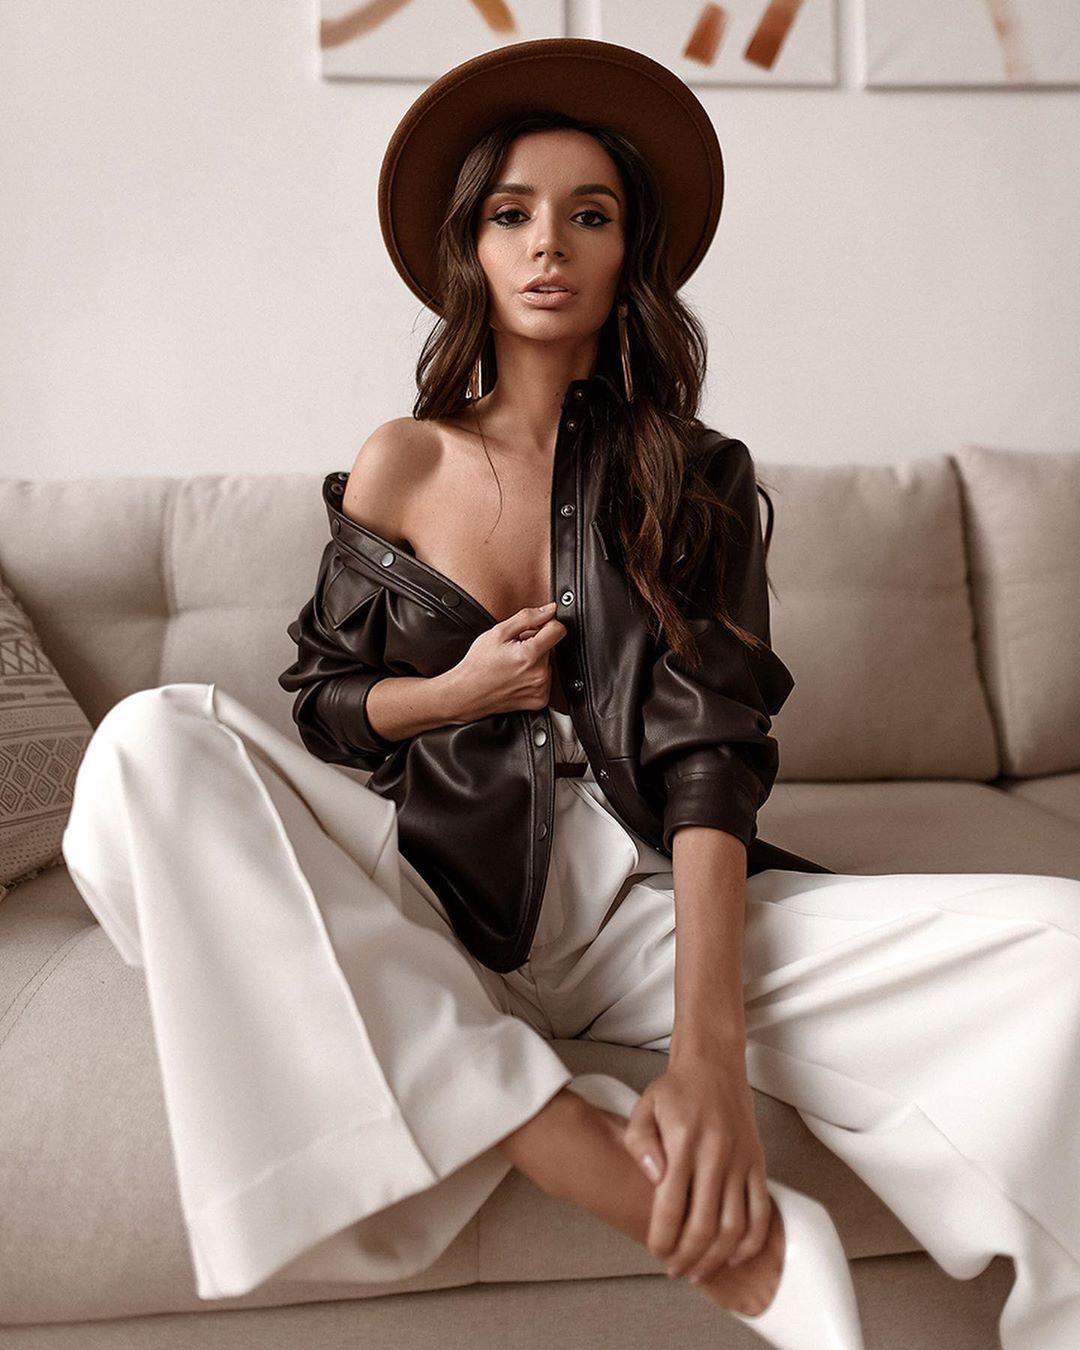 Ekaterina Zueva dress for women, photoshoot poses, legs picture